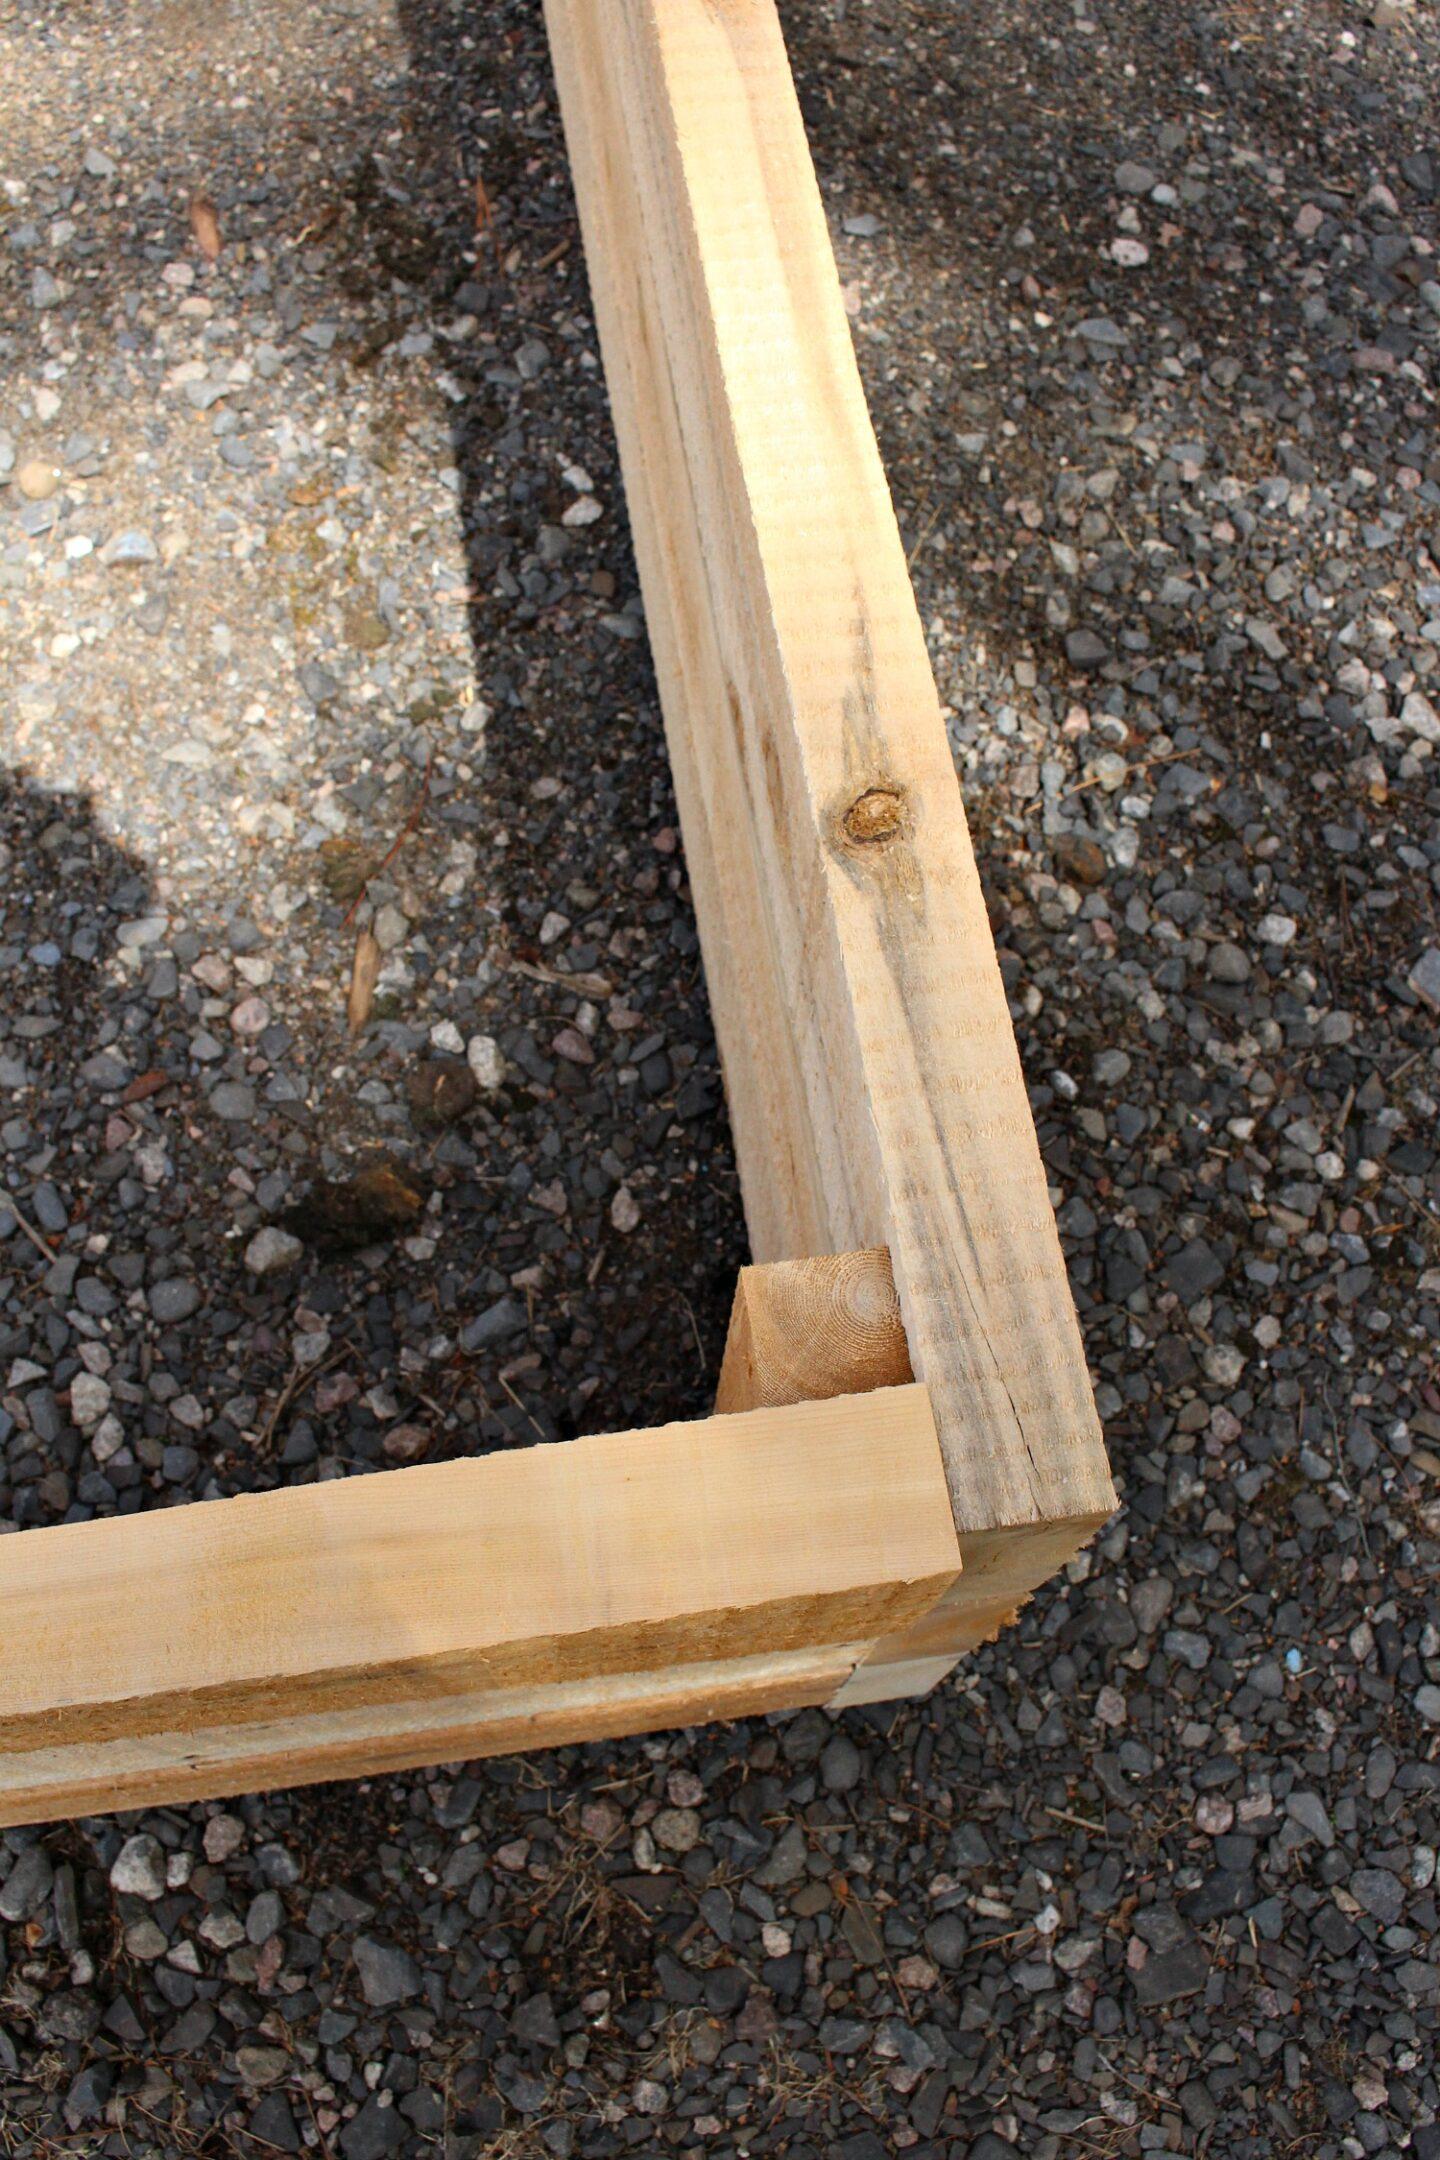 How to Build Garden Boxes